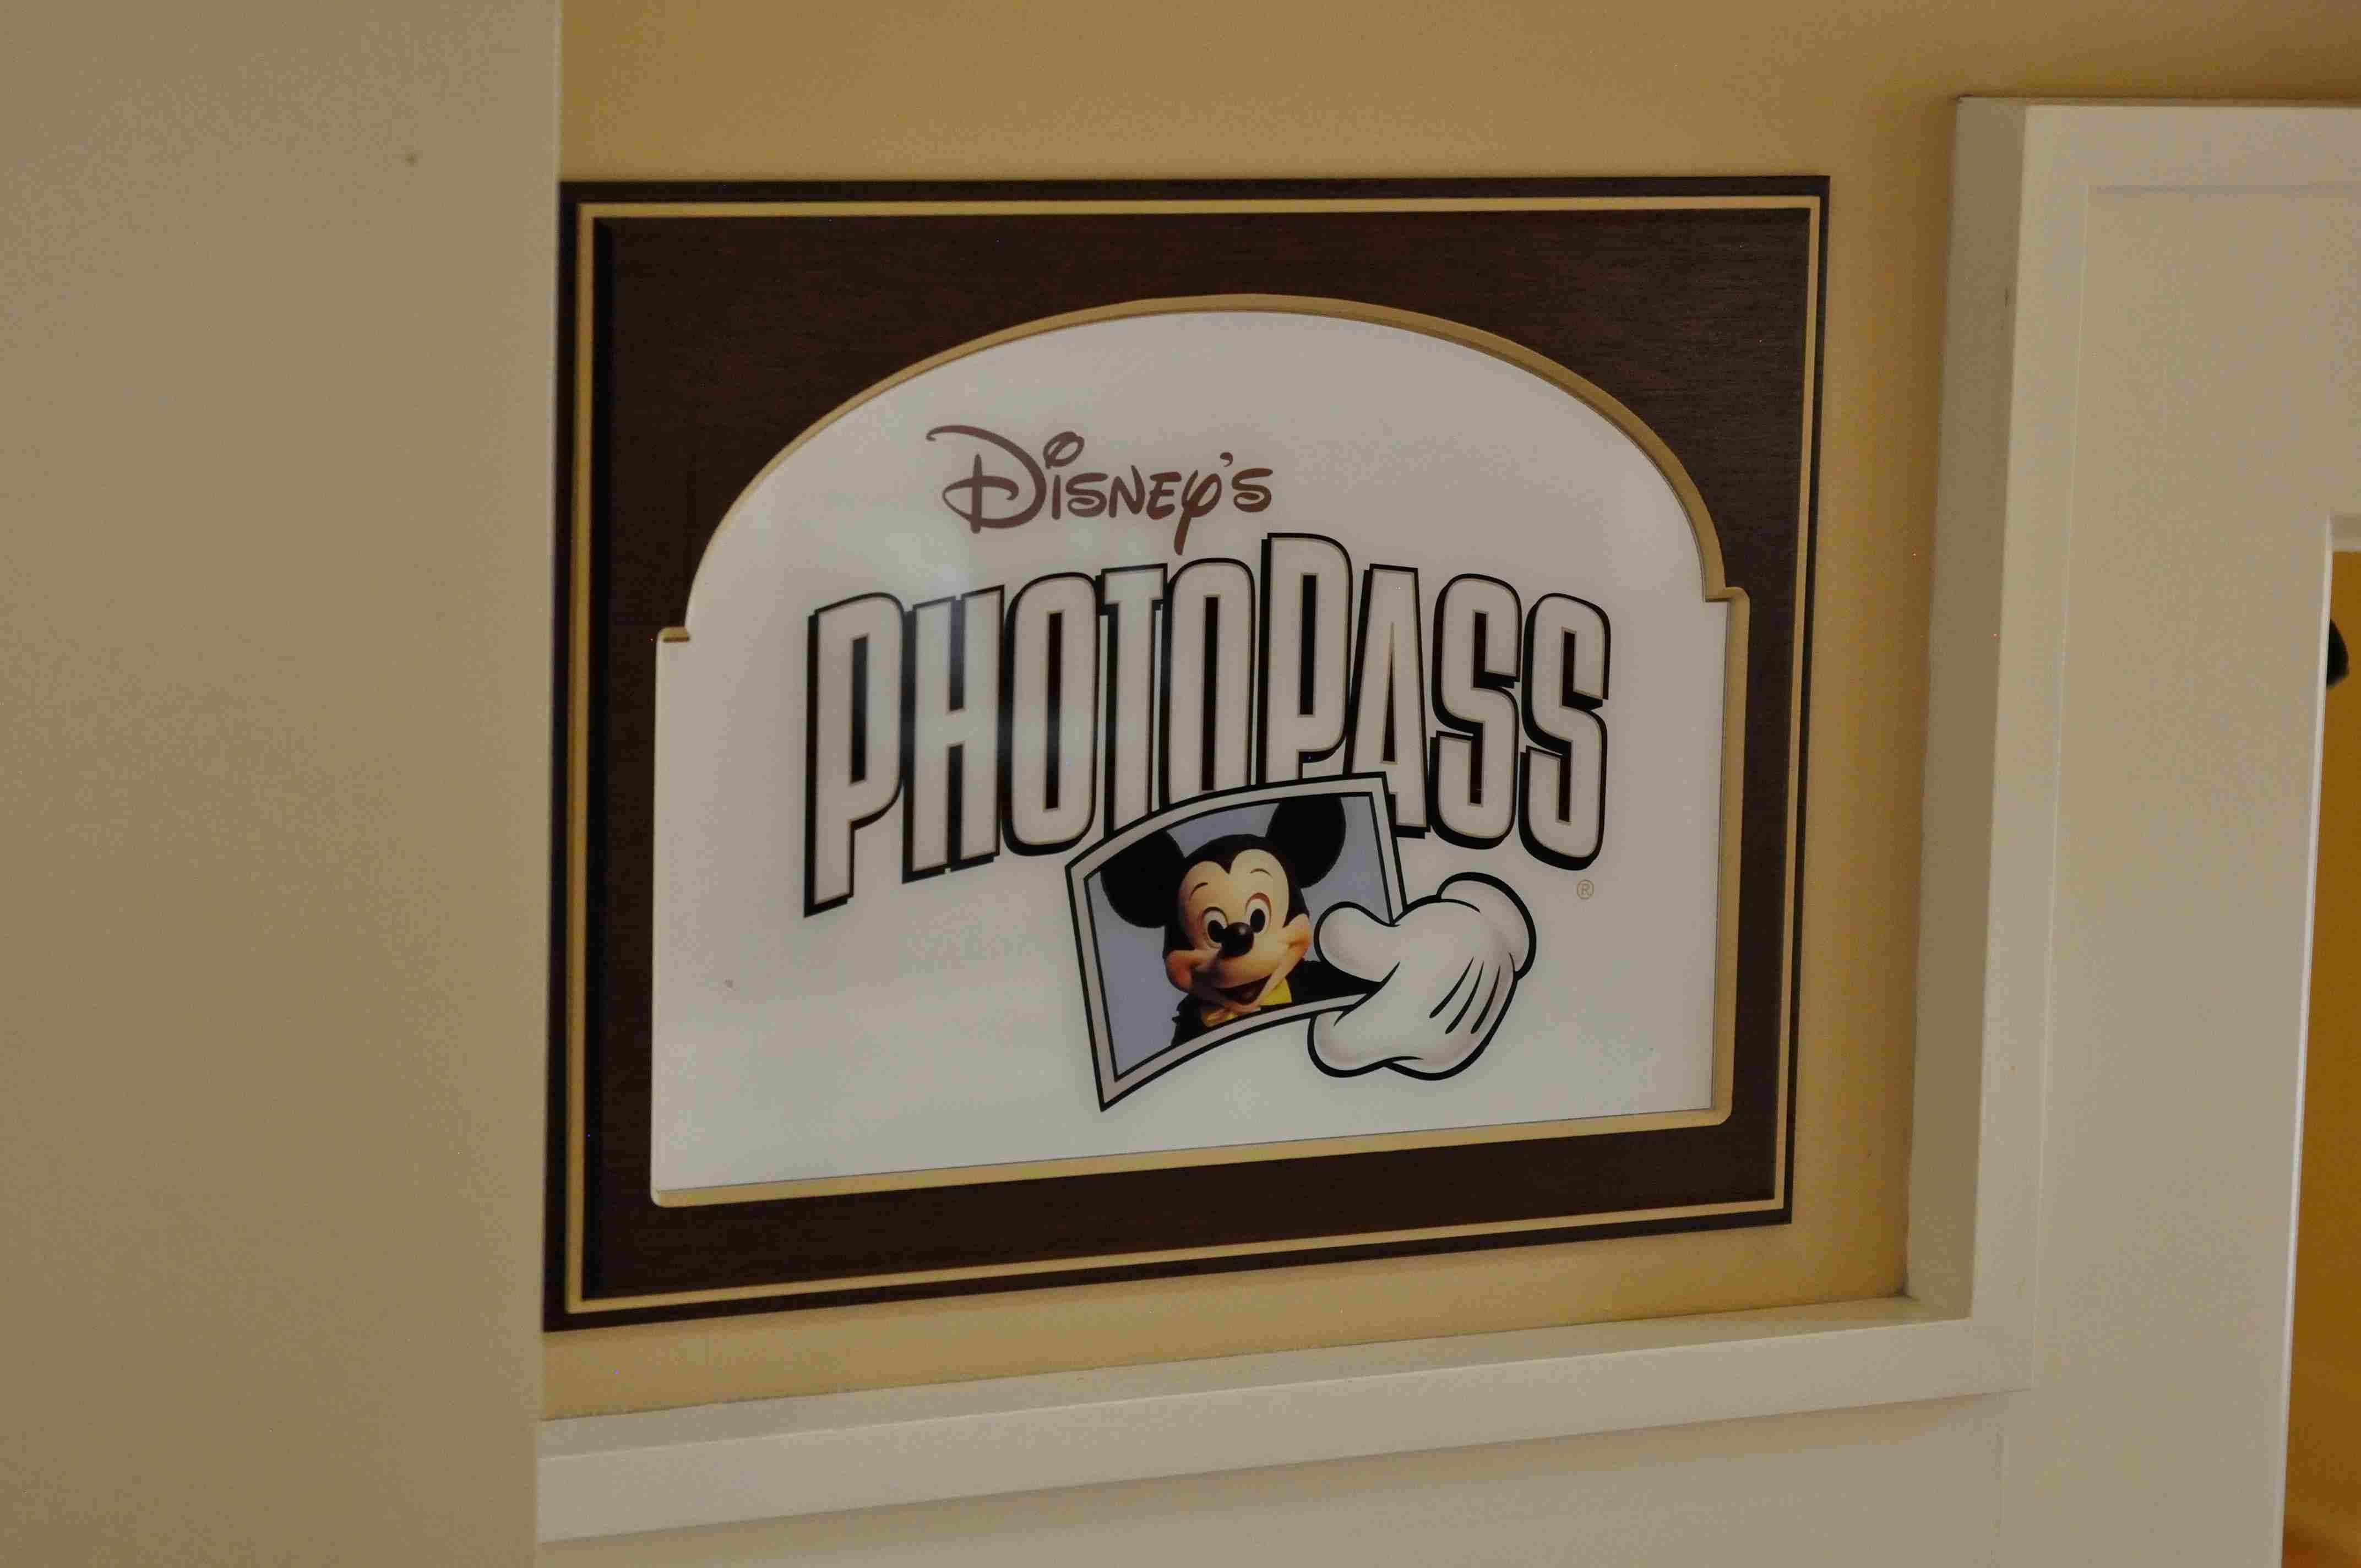 App Offers Disneyland Guests PhotoPass Options